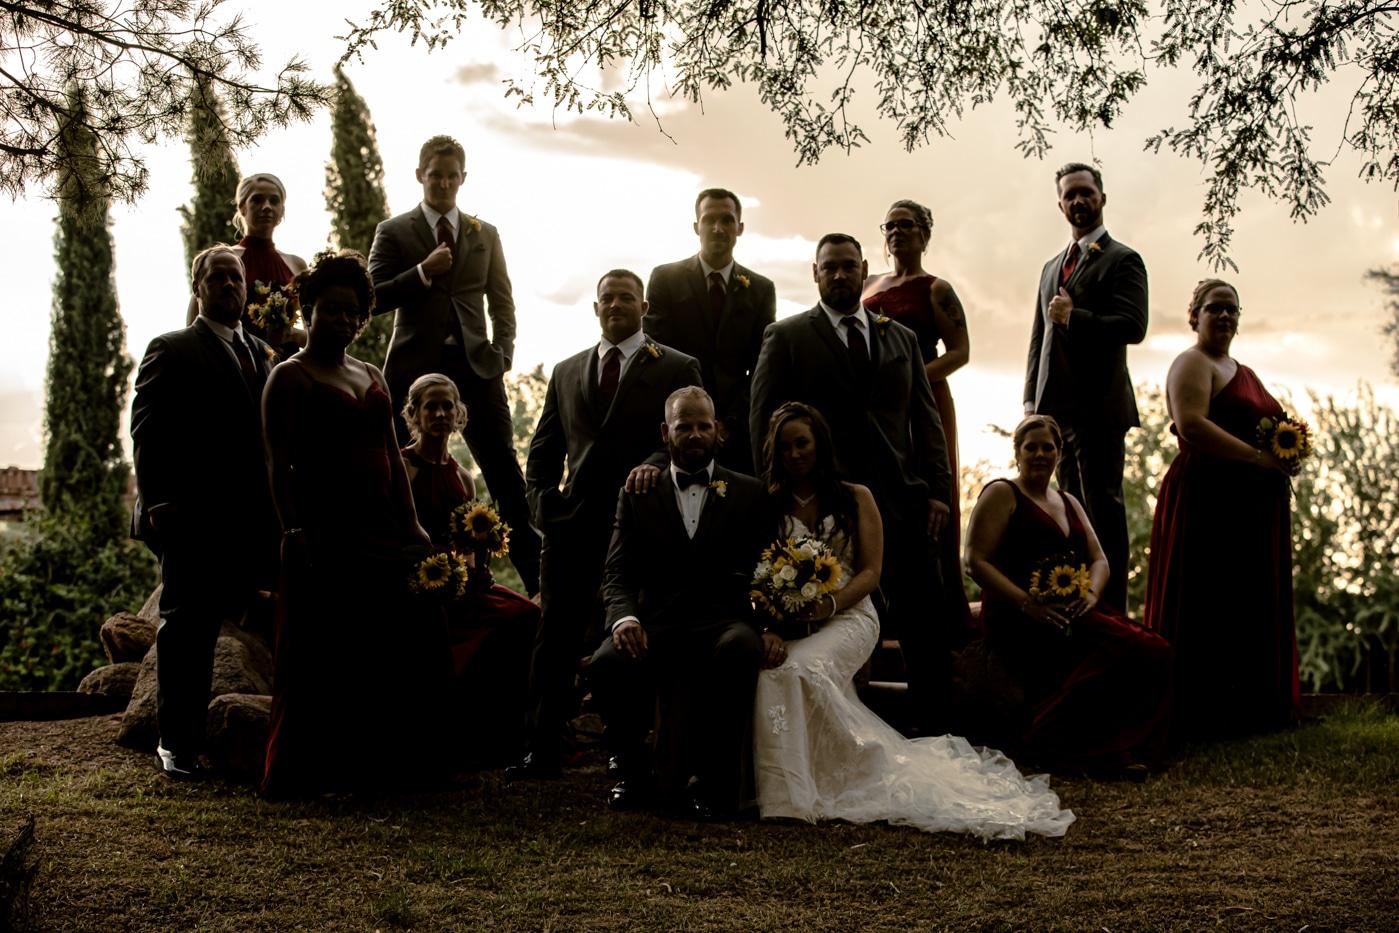 Wedding party creative photo